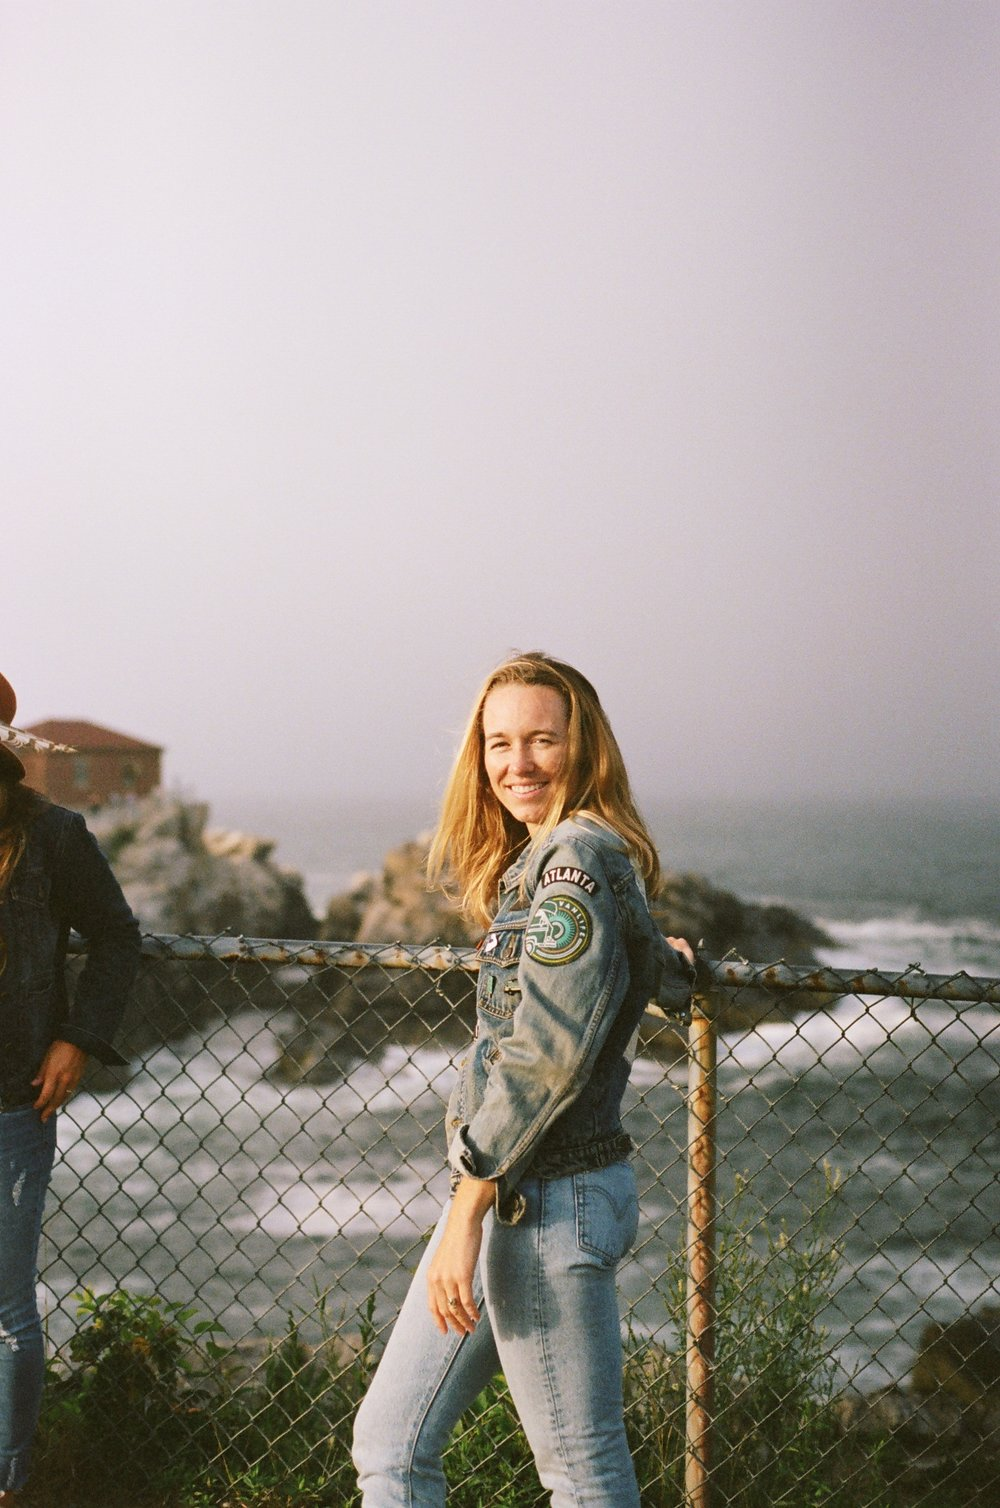 MAK at the Portland Head Lighthouse, 35mm film